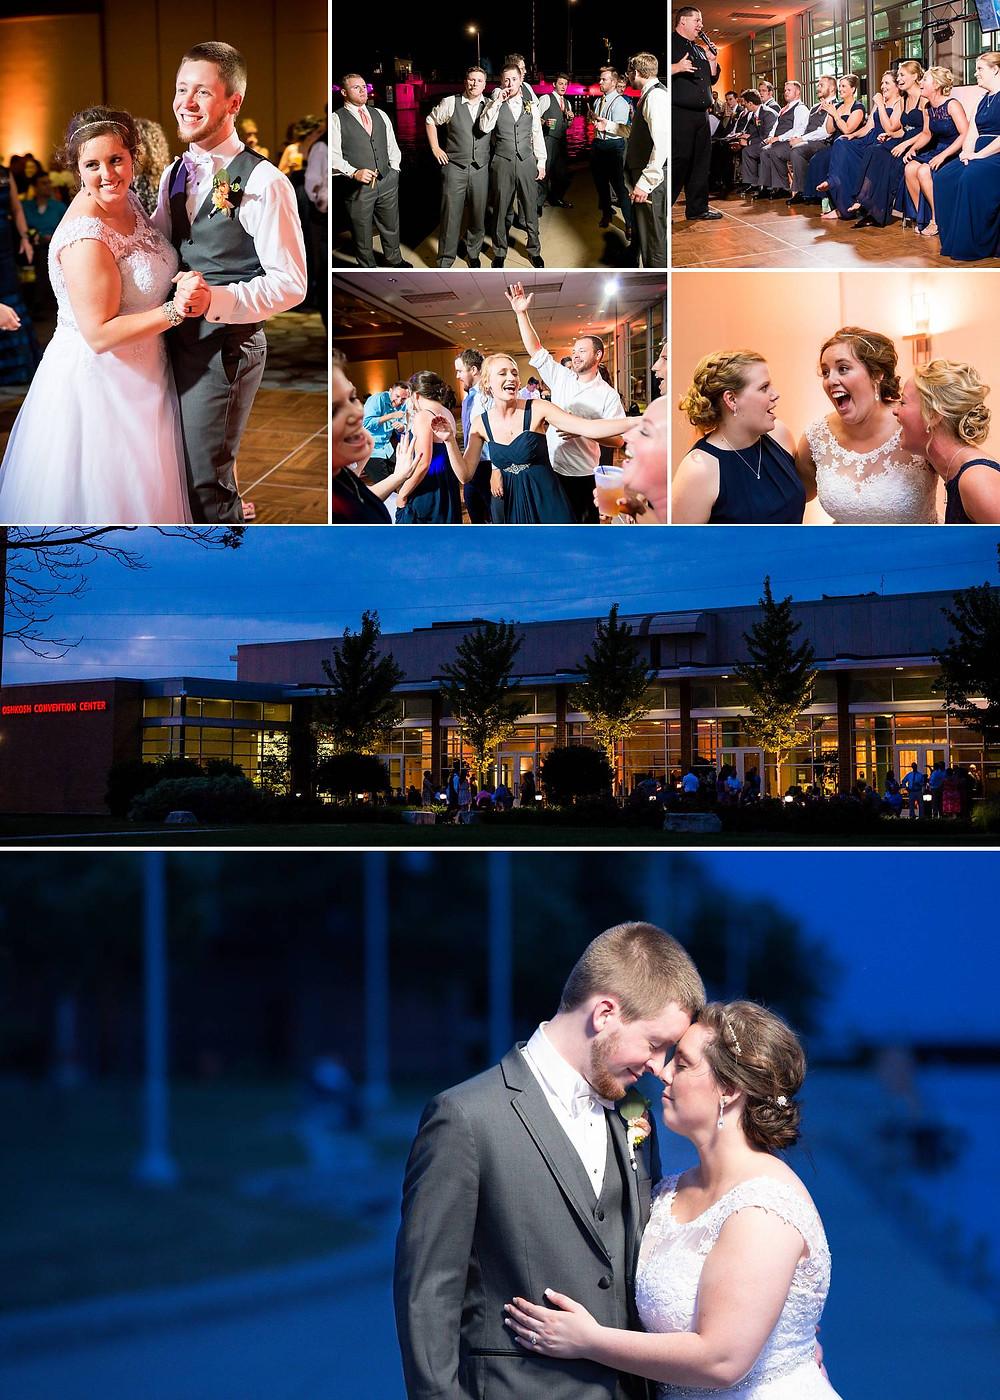 Oshkosh Wisconsin Convention Center Wedding Reception   Lanari Photography